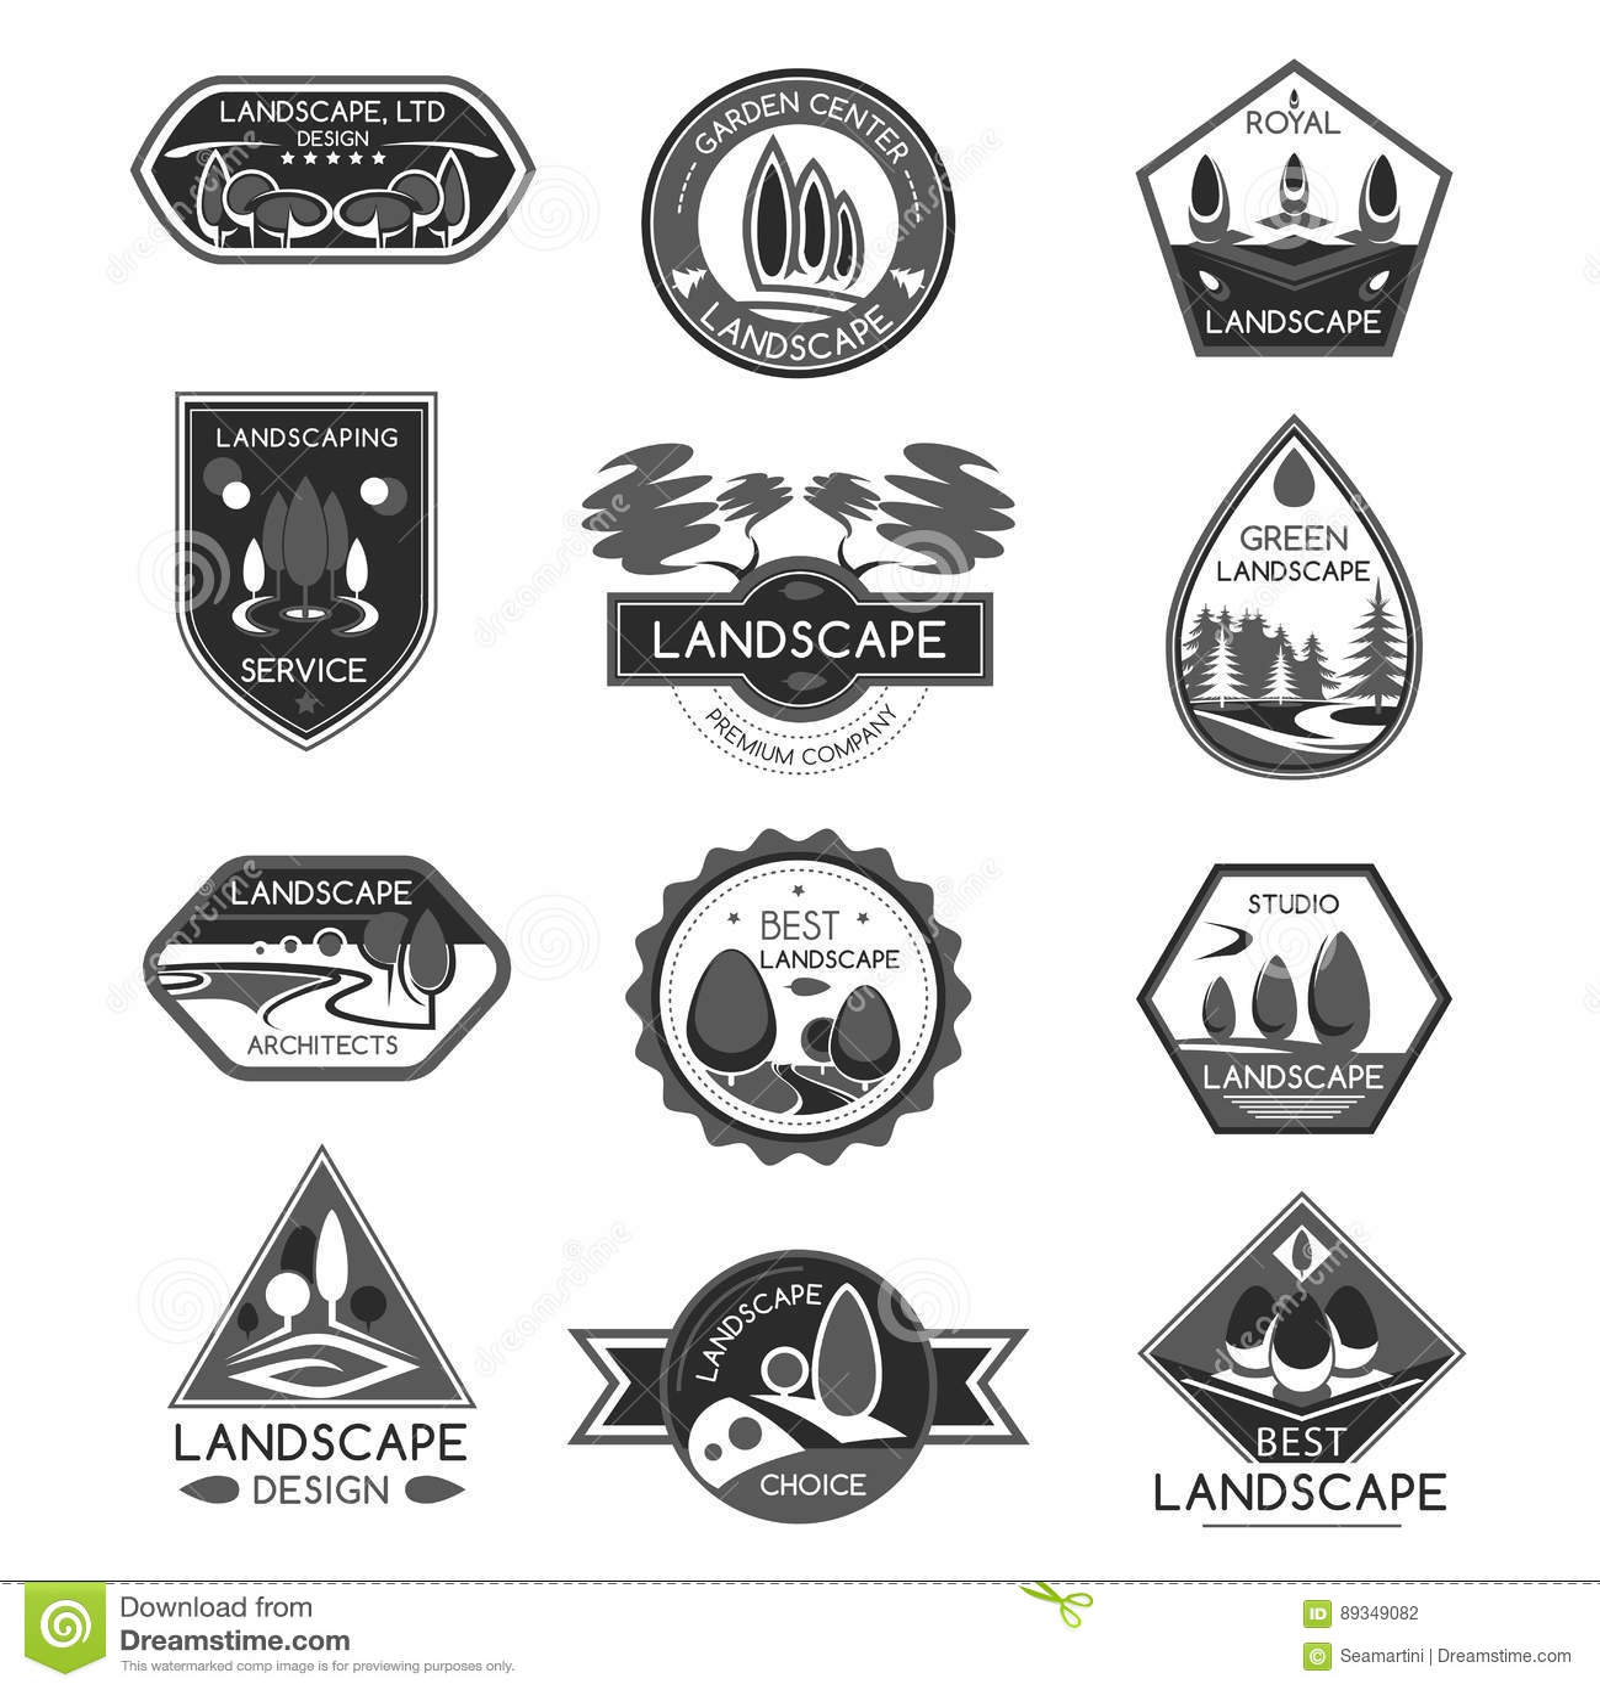 Landscape Design Company Vector Icons Set Stock Vector